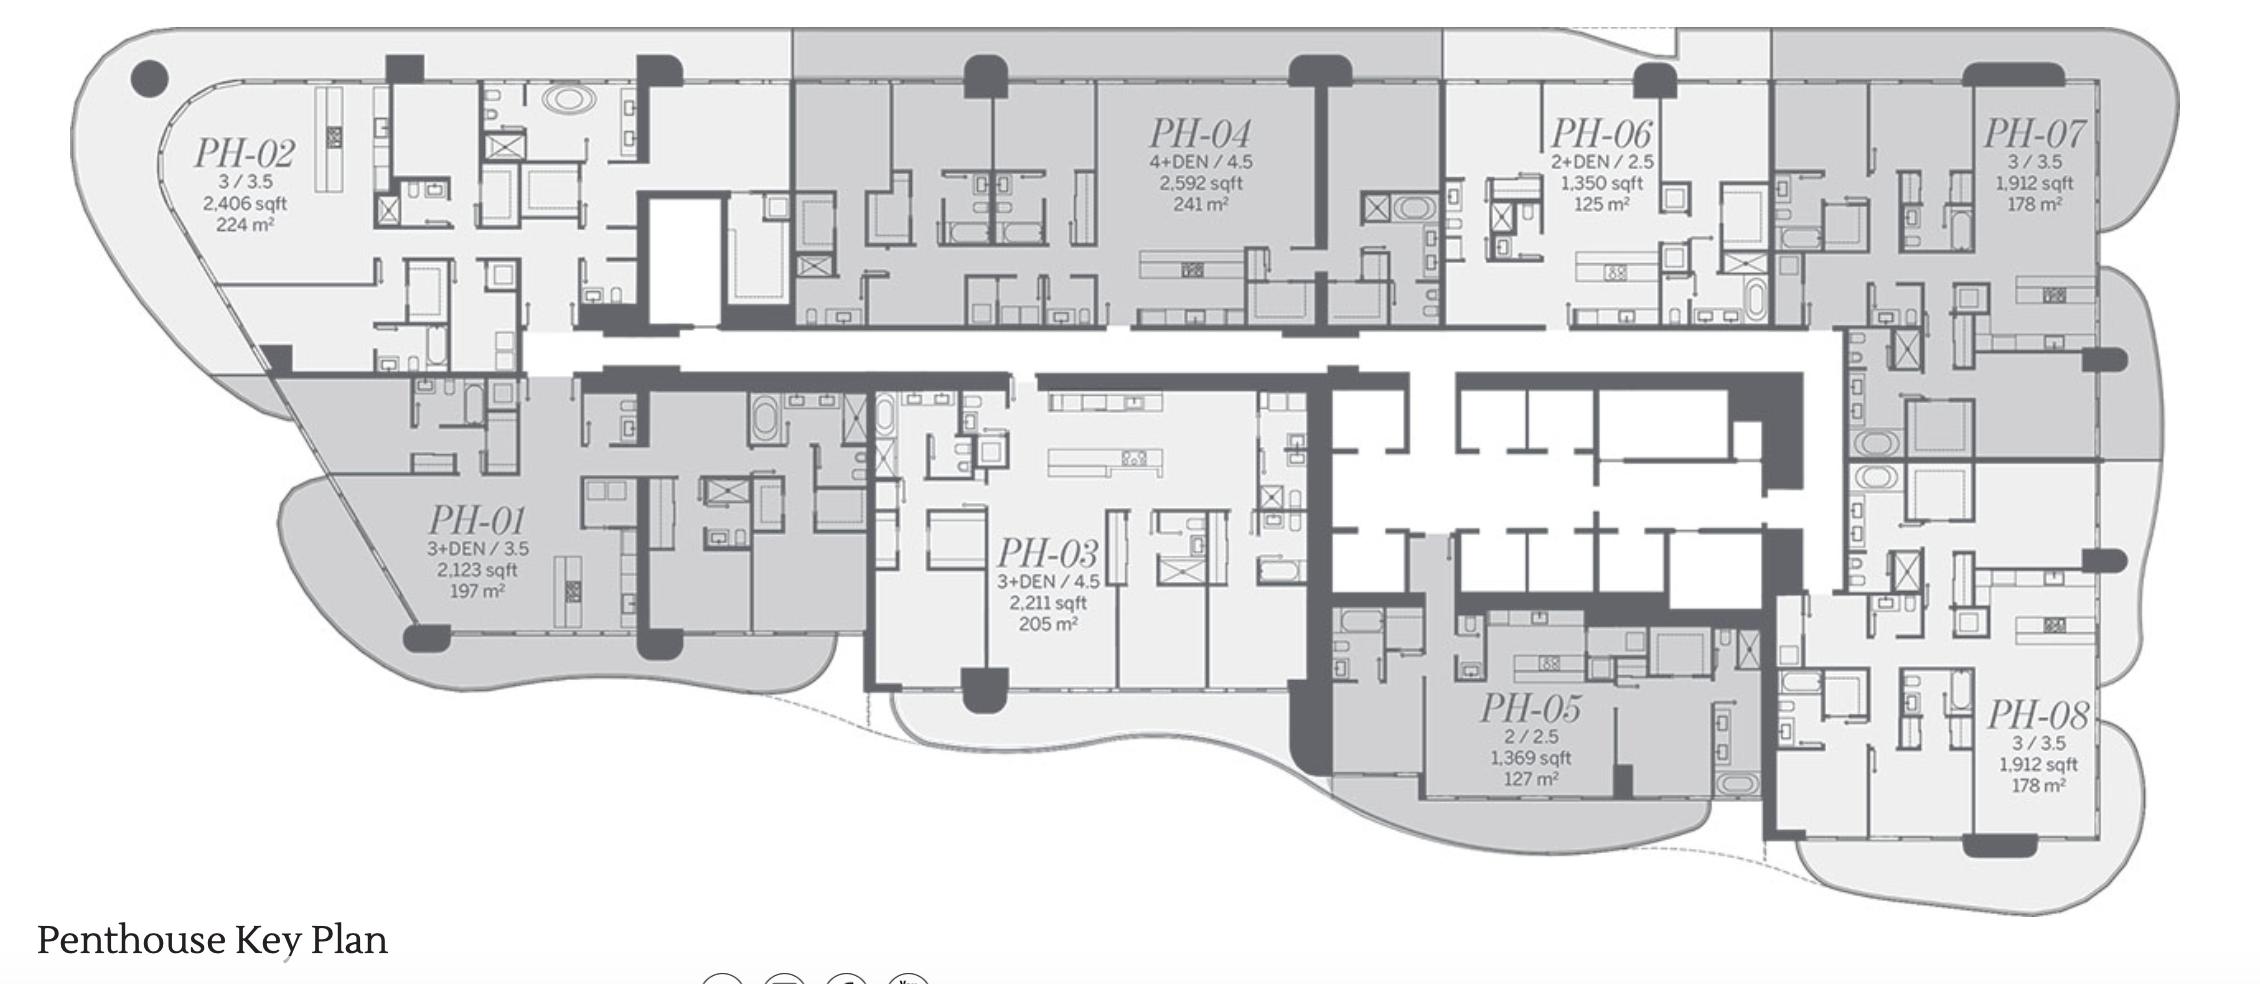 Penthouse Site Plan